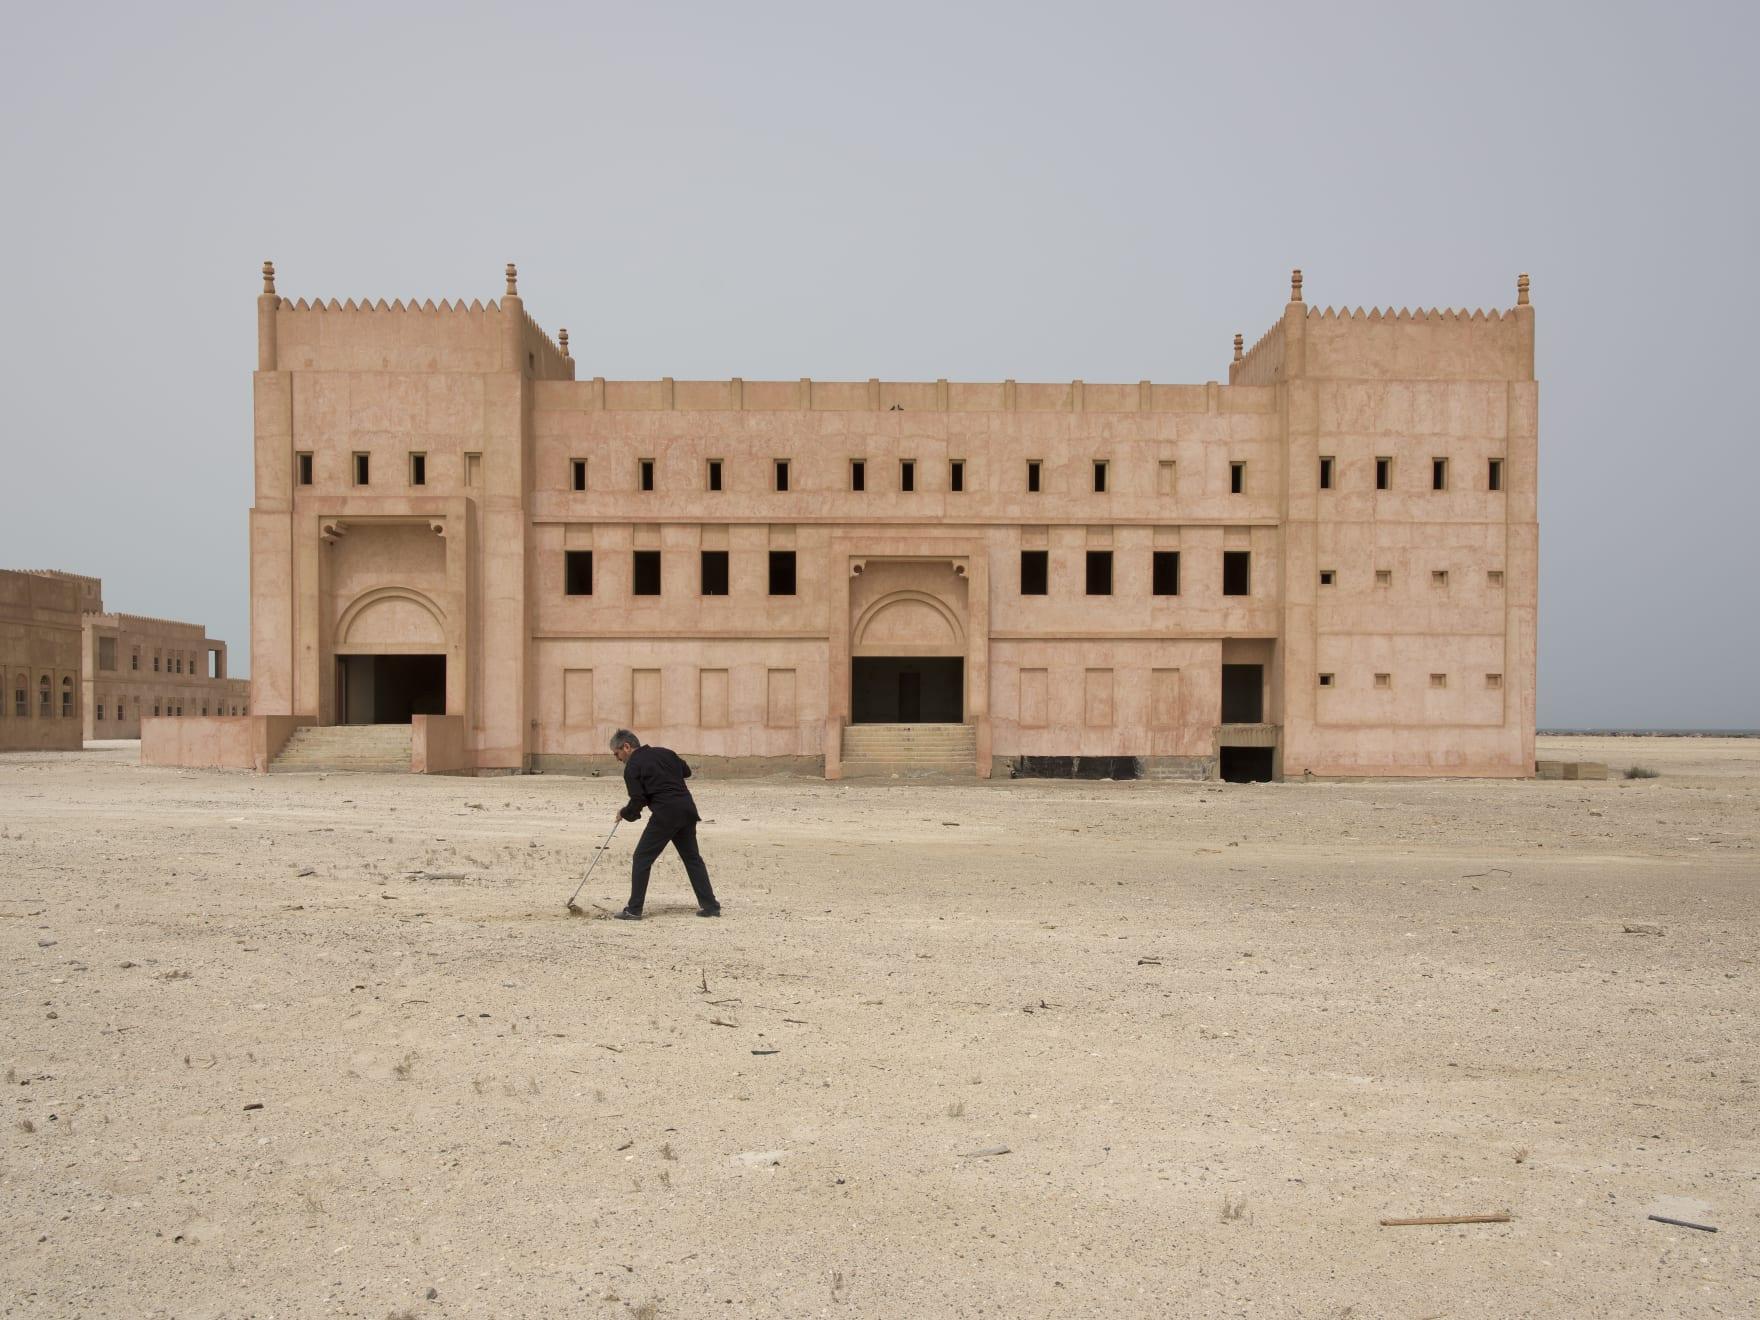 Tarek Al-Ghoussein, Abu Dhabi Archipelago (Massnoua 3), 2015-, Digital Print, 60 x 80cm, Edition of 6 + 1AP USD 8,000 (Excluding VAT)